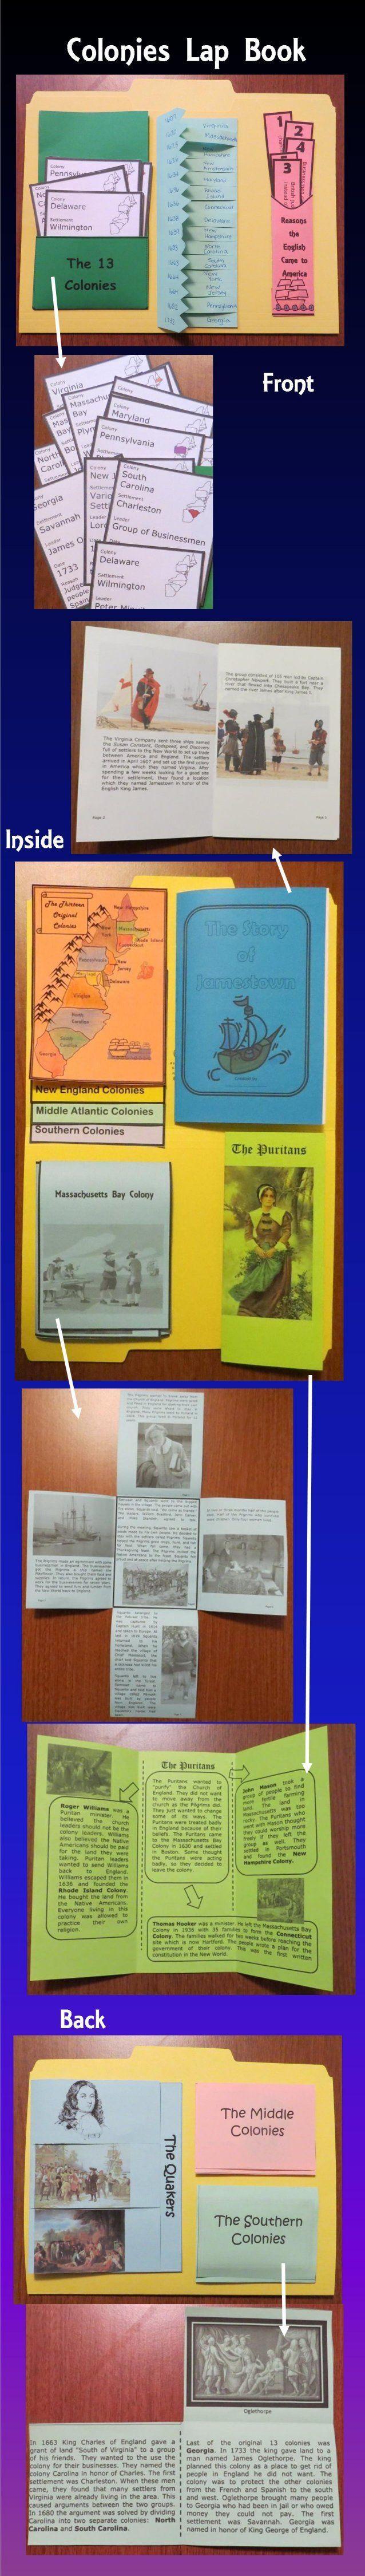 Colonial Lab Book colonial america